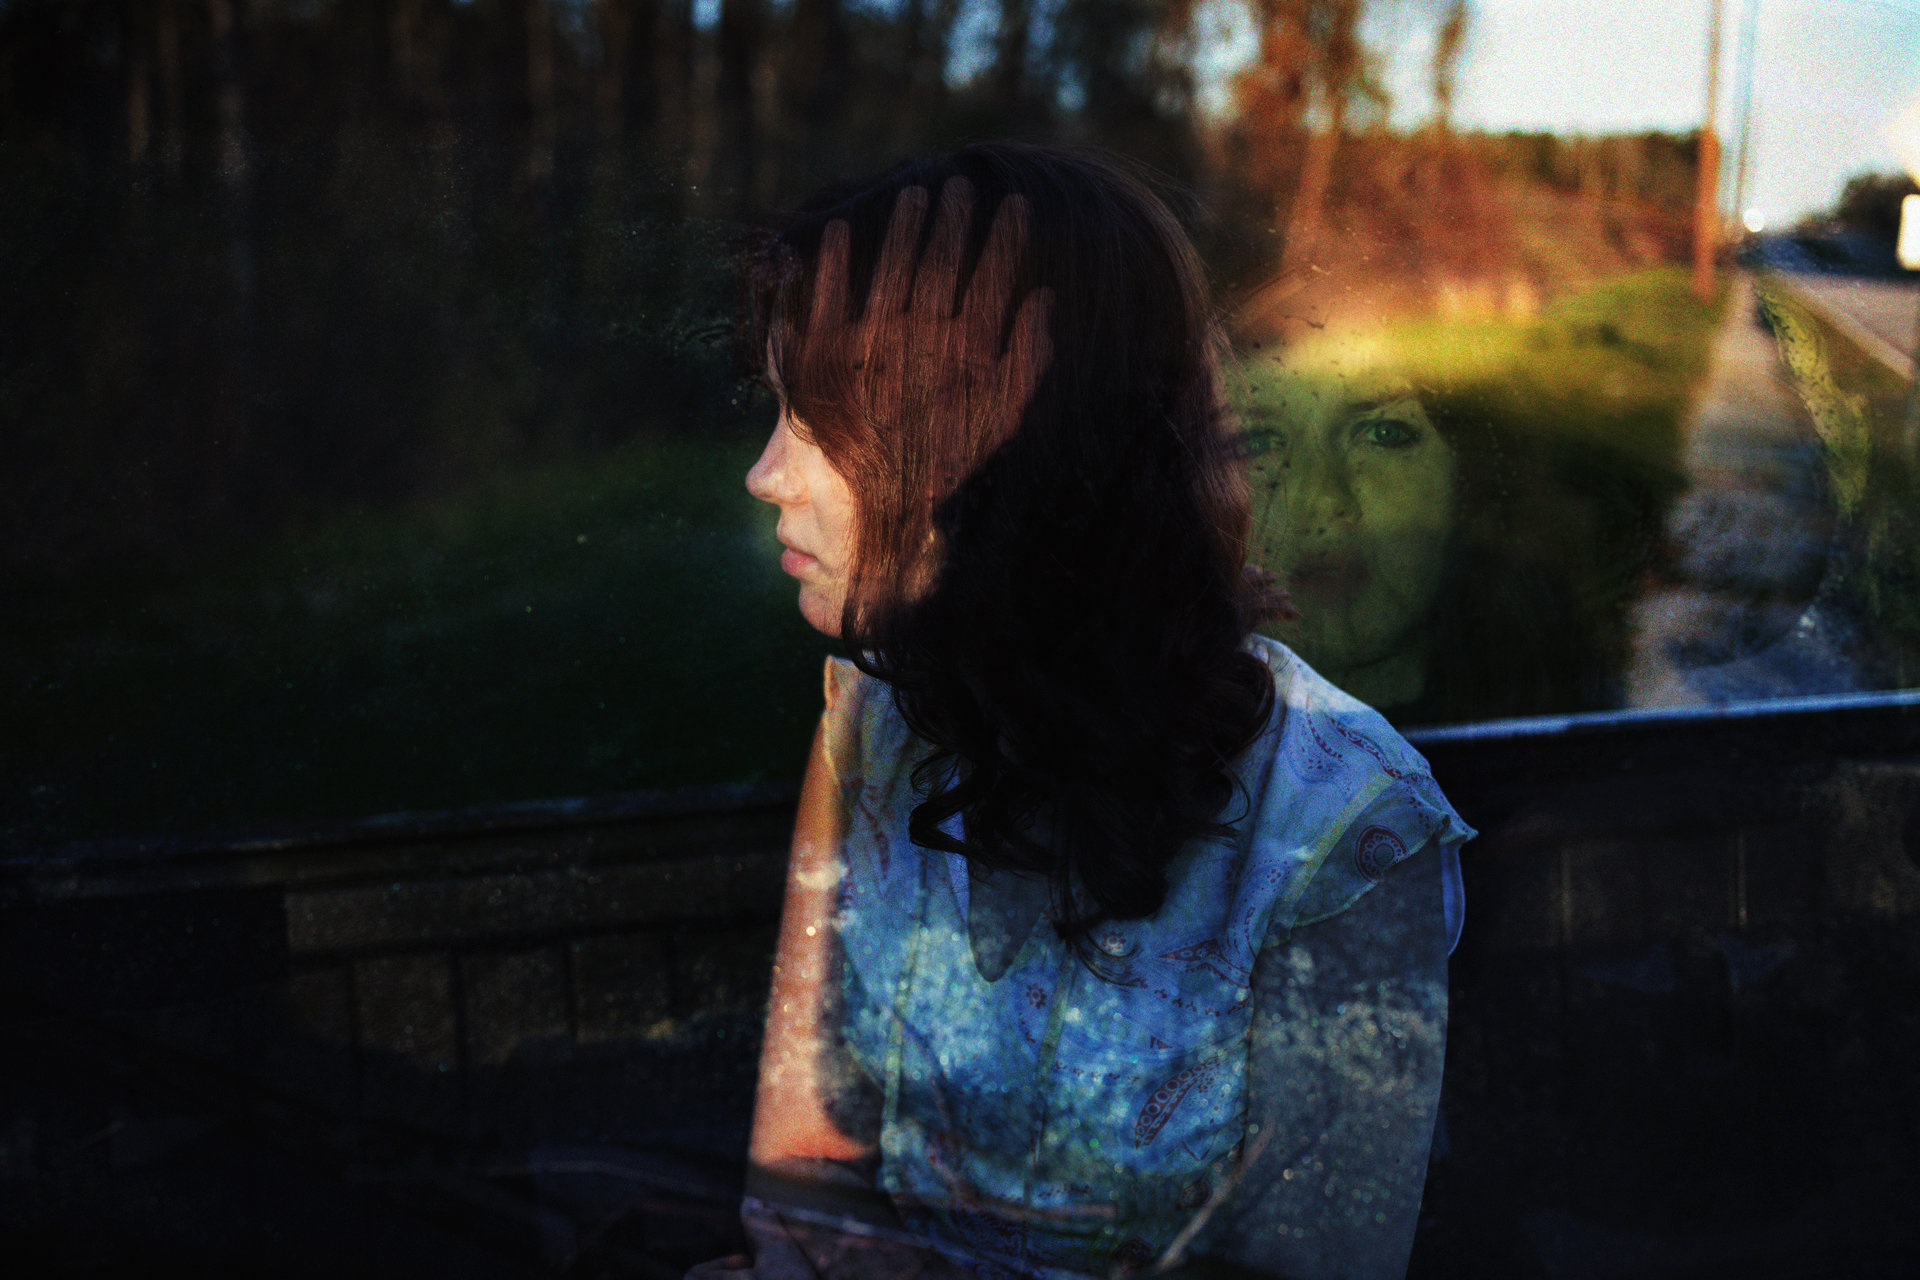 Subconscious (Elise)